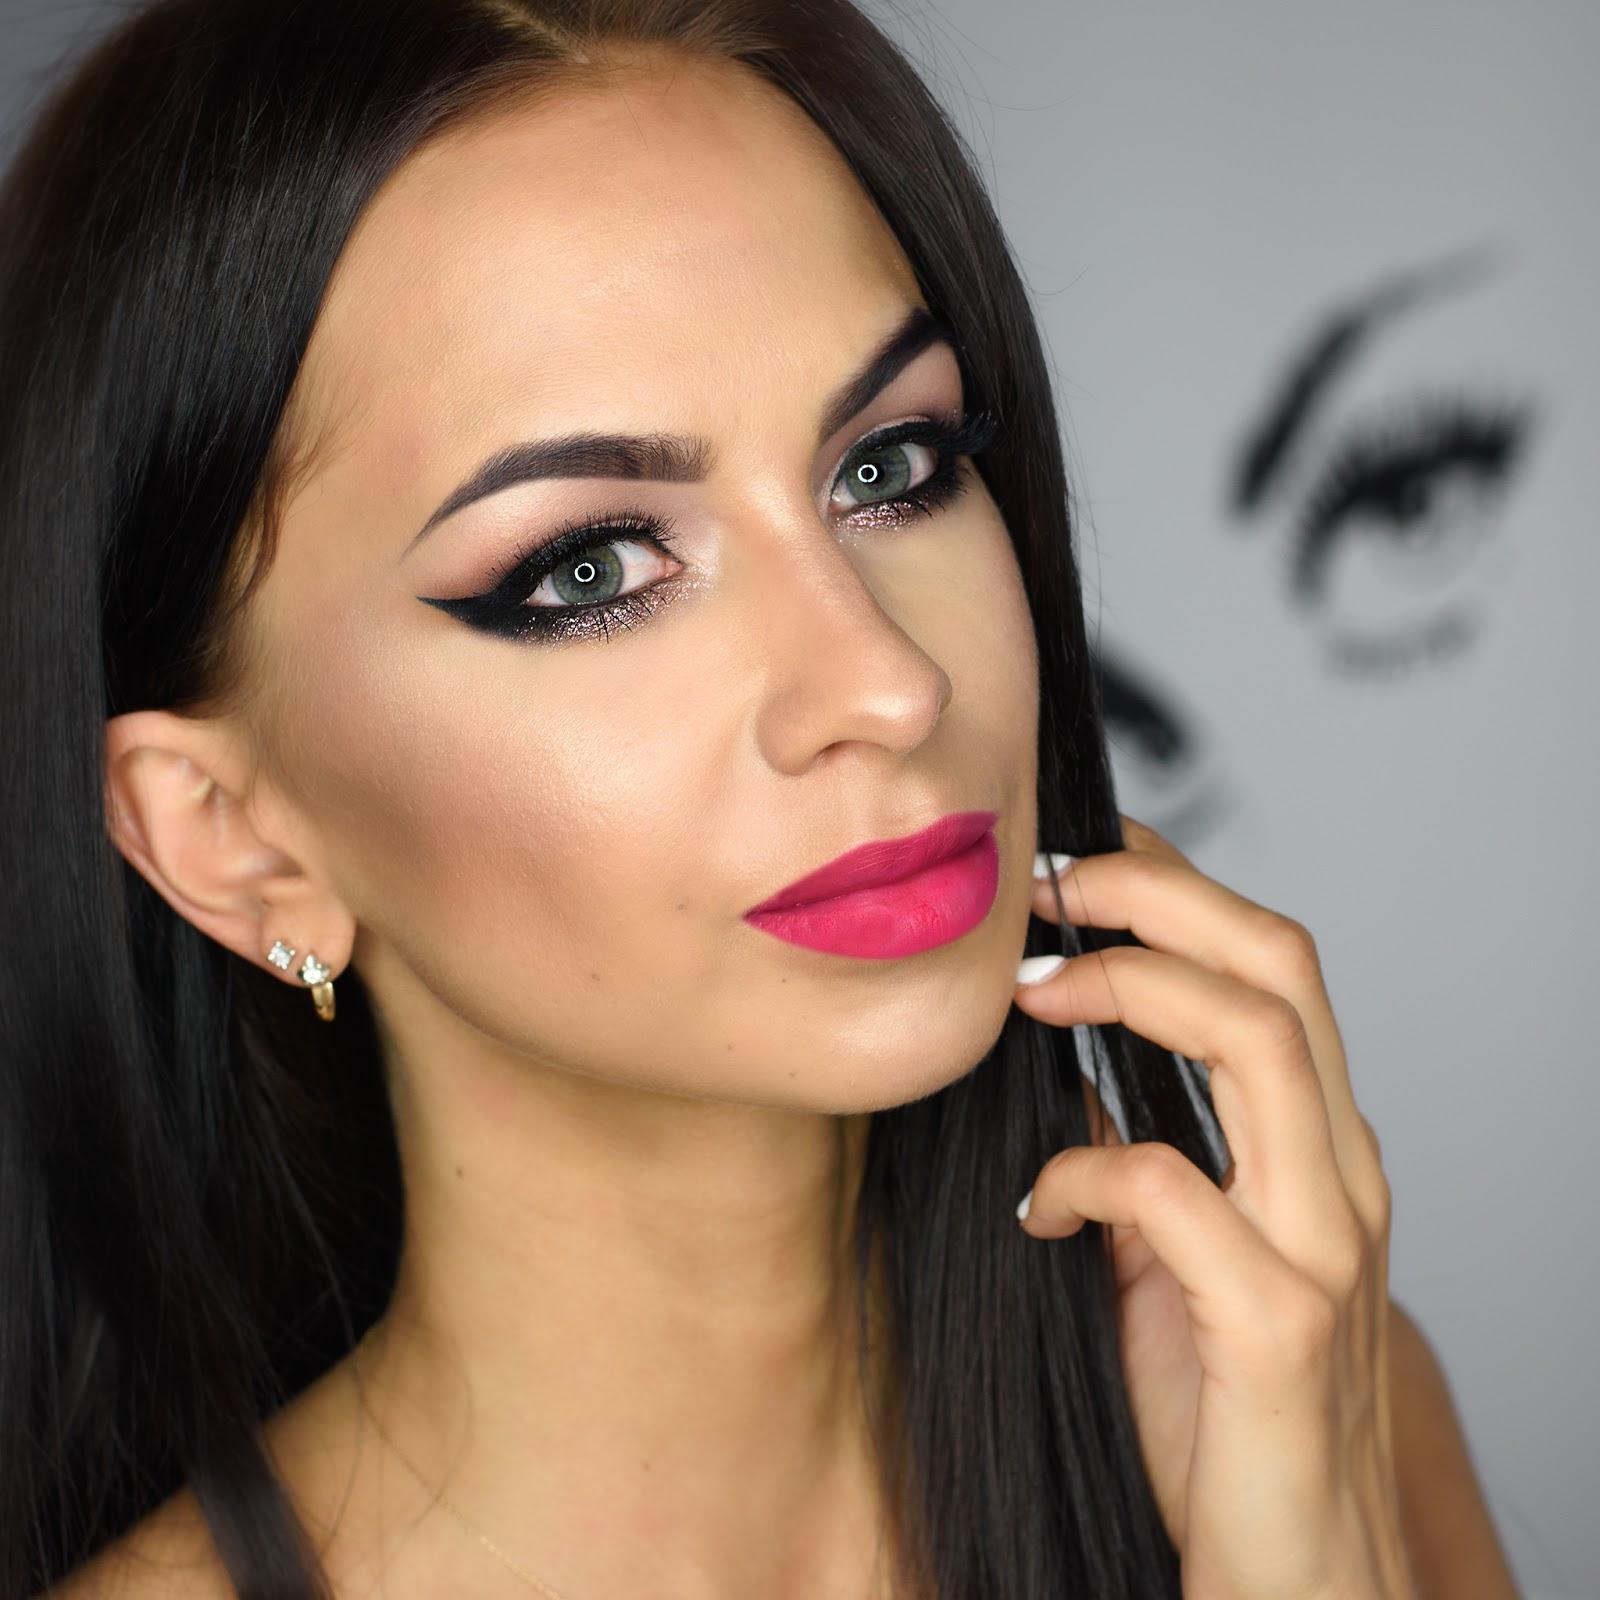 makeup tutorial, makijaż, makijaż brwi, Makijaż karnawałowy, makijaż kolorowy, makijaż krok po kroku, makijaż oka, makijaż tutorial, makijaż wieczorowy, makijaż youtube,